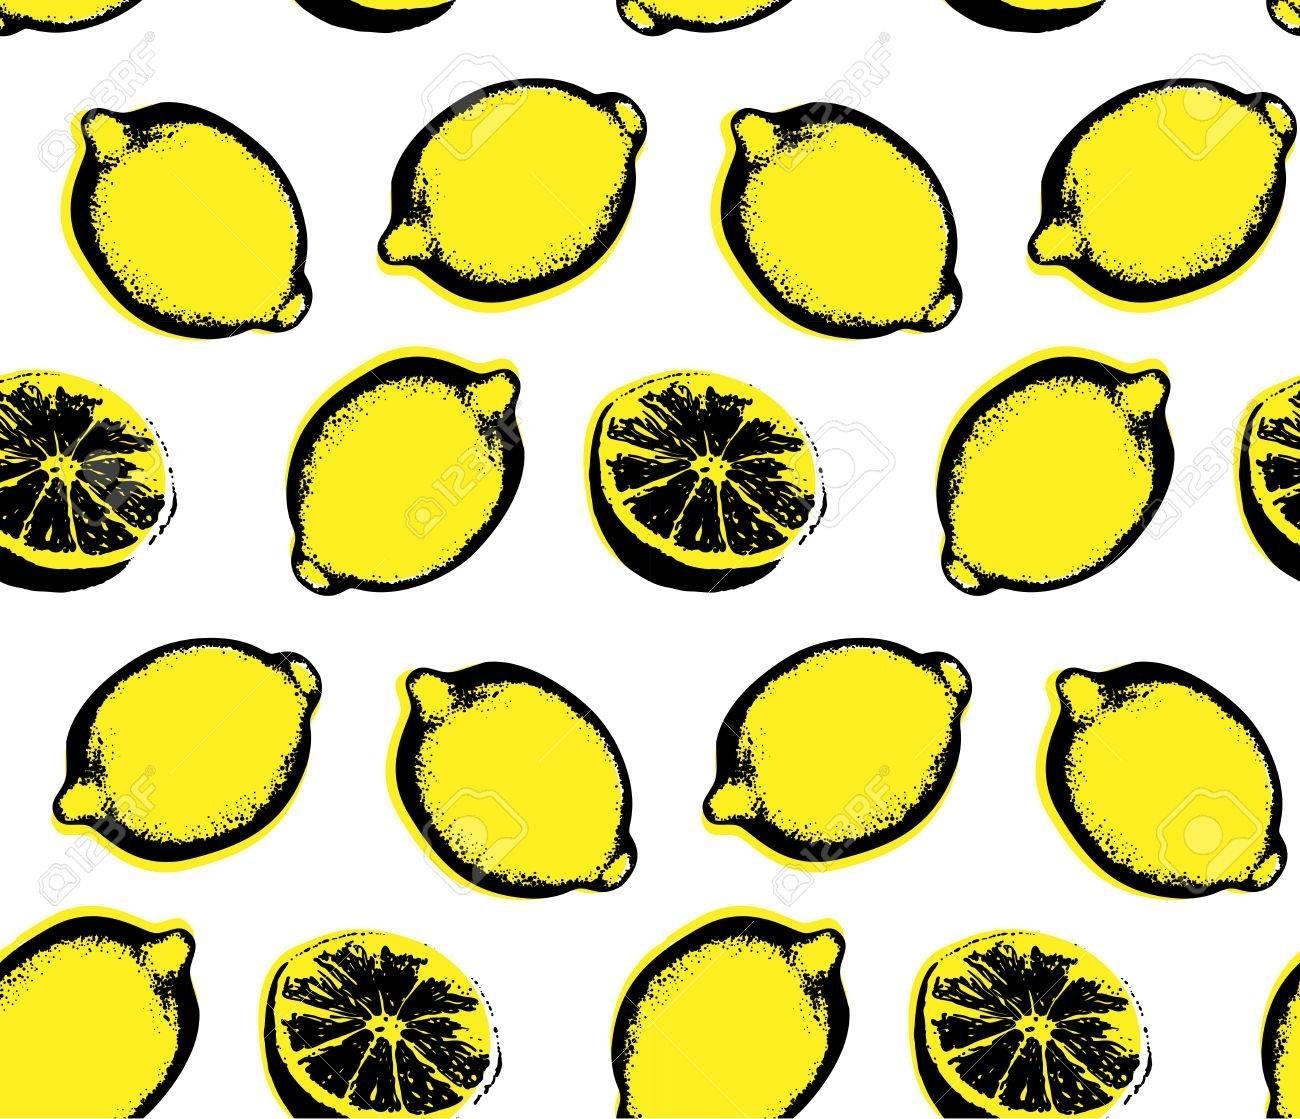 Vector Hand Drawn Lemon Seamless Pattern. Sketch. Pop Art. Perfect regarding Most Current Lemon Wall Art